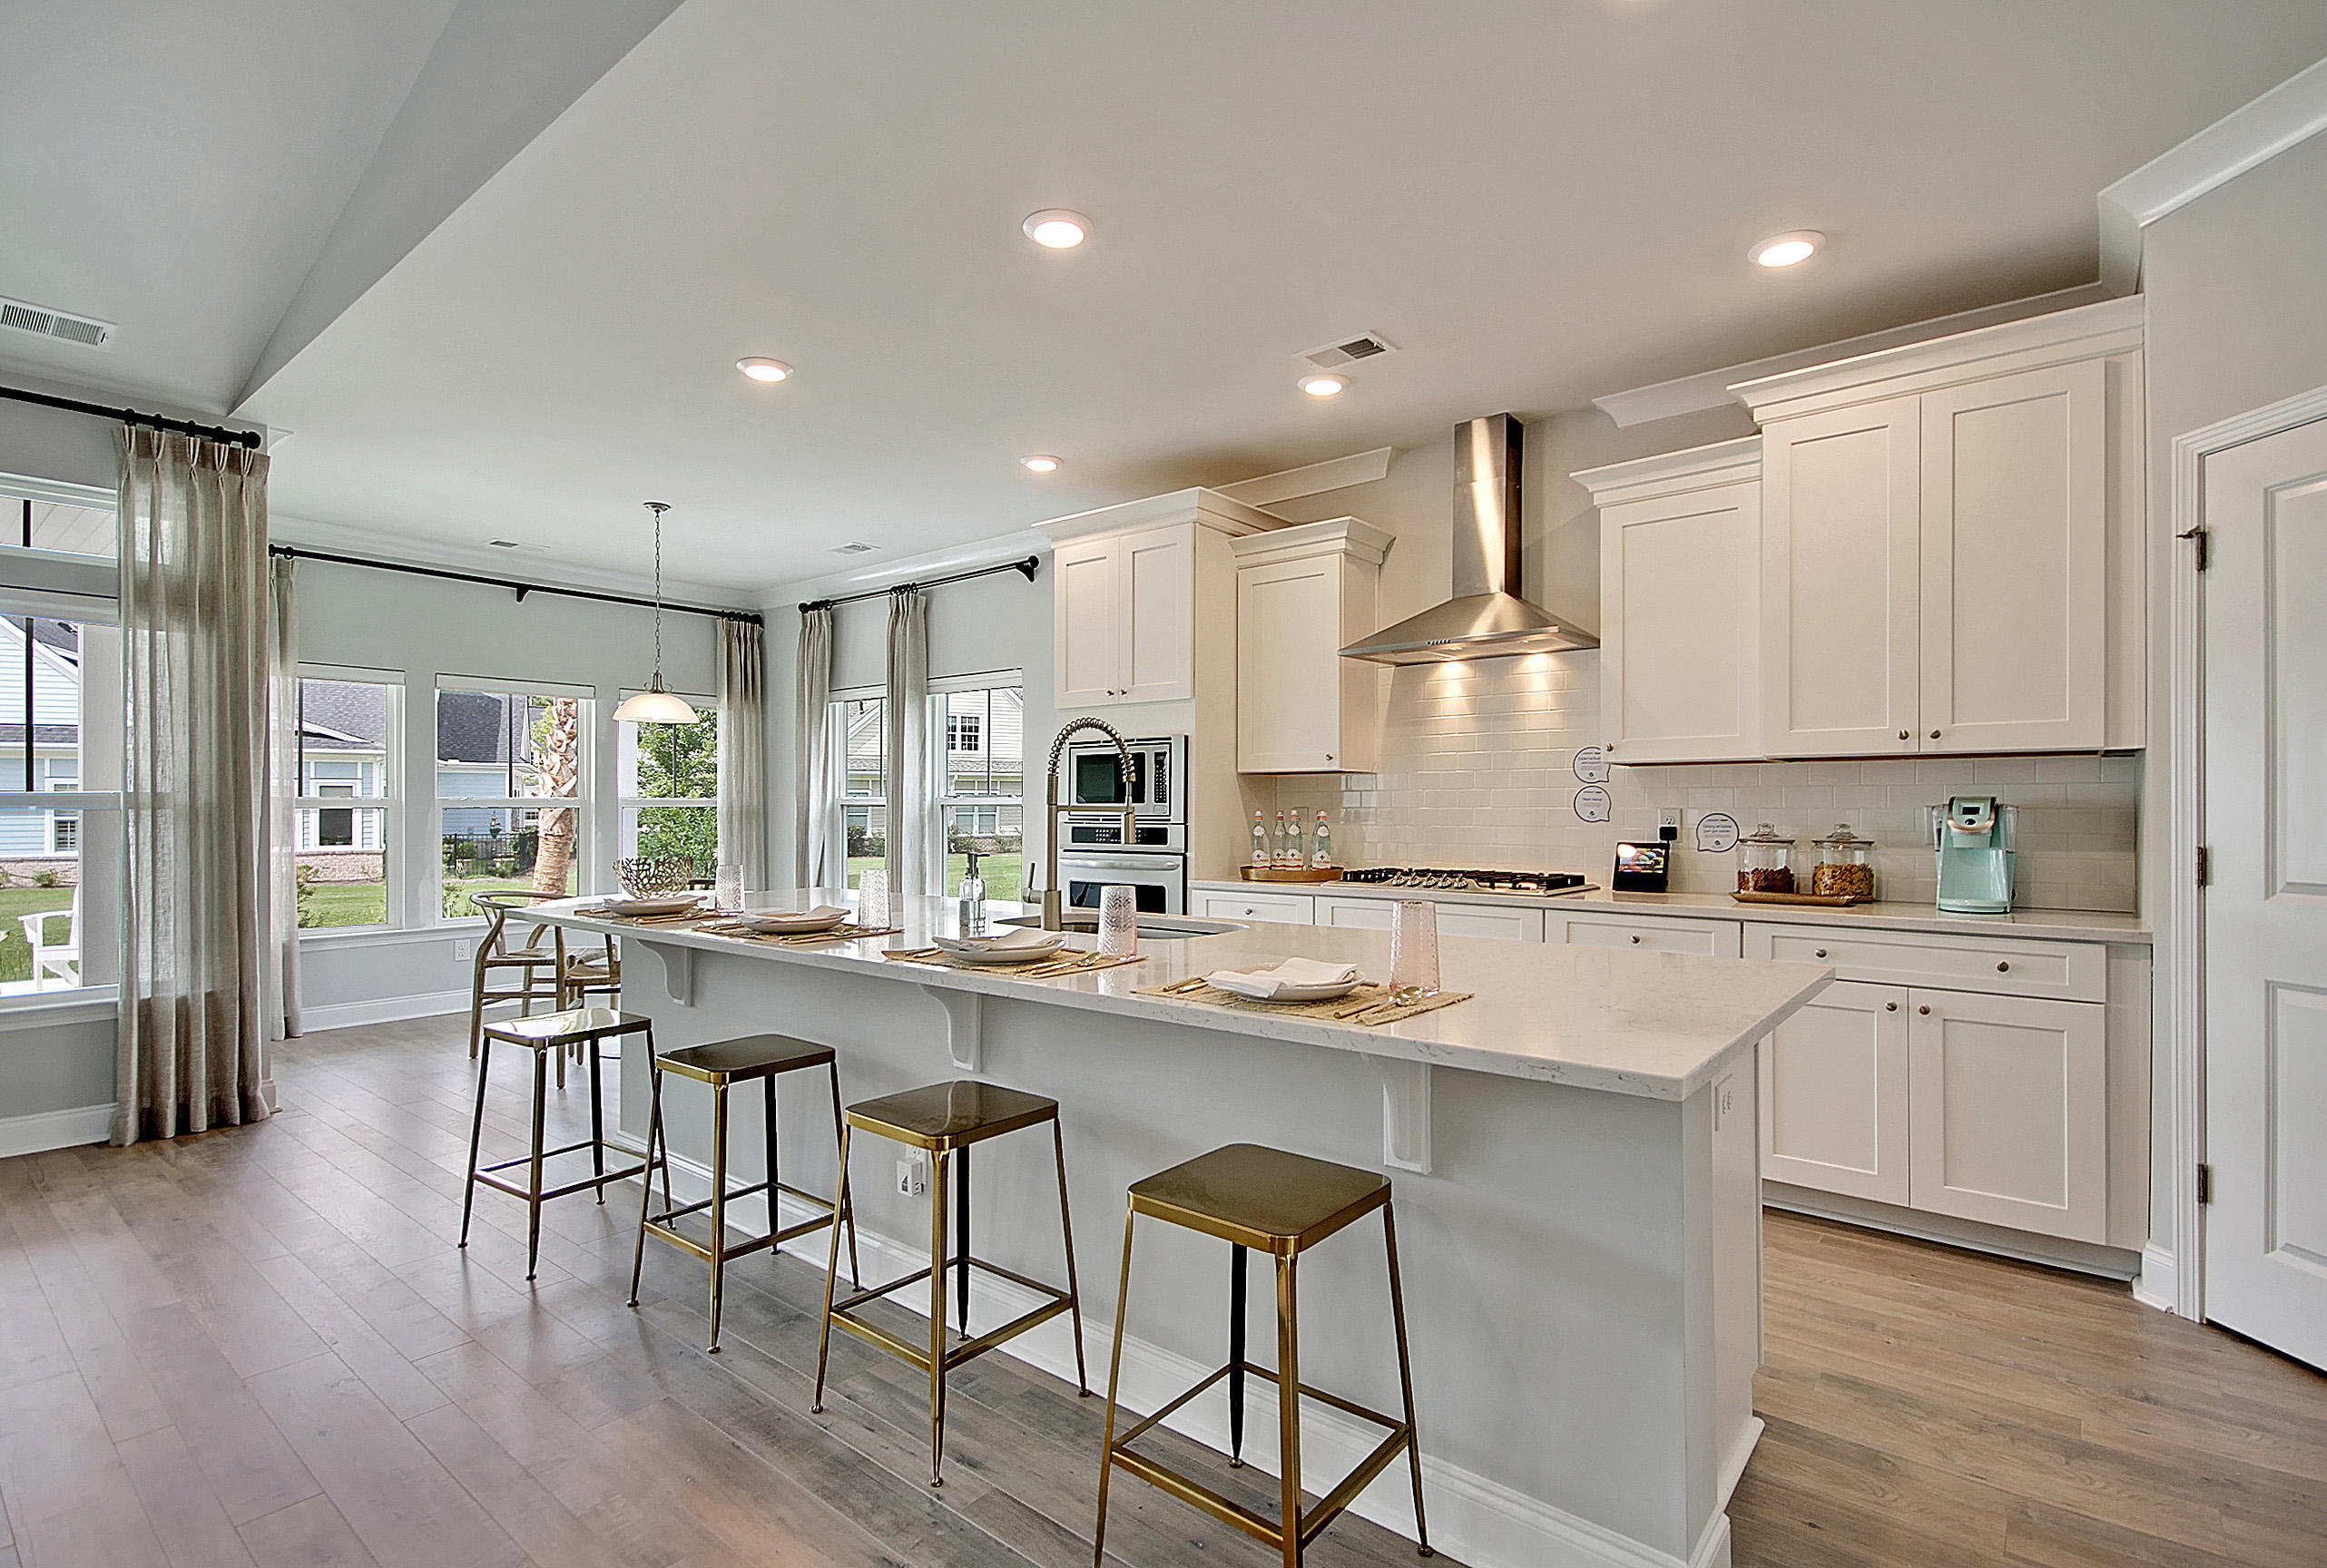 Park West Homes For Sale - 3066 Rice Field, Mount Pleasant, SC - 21